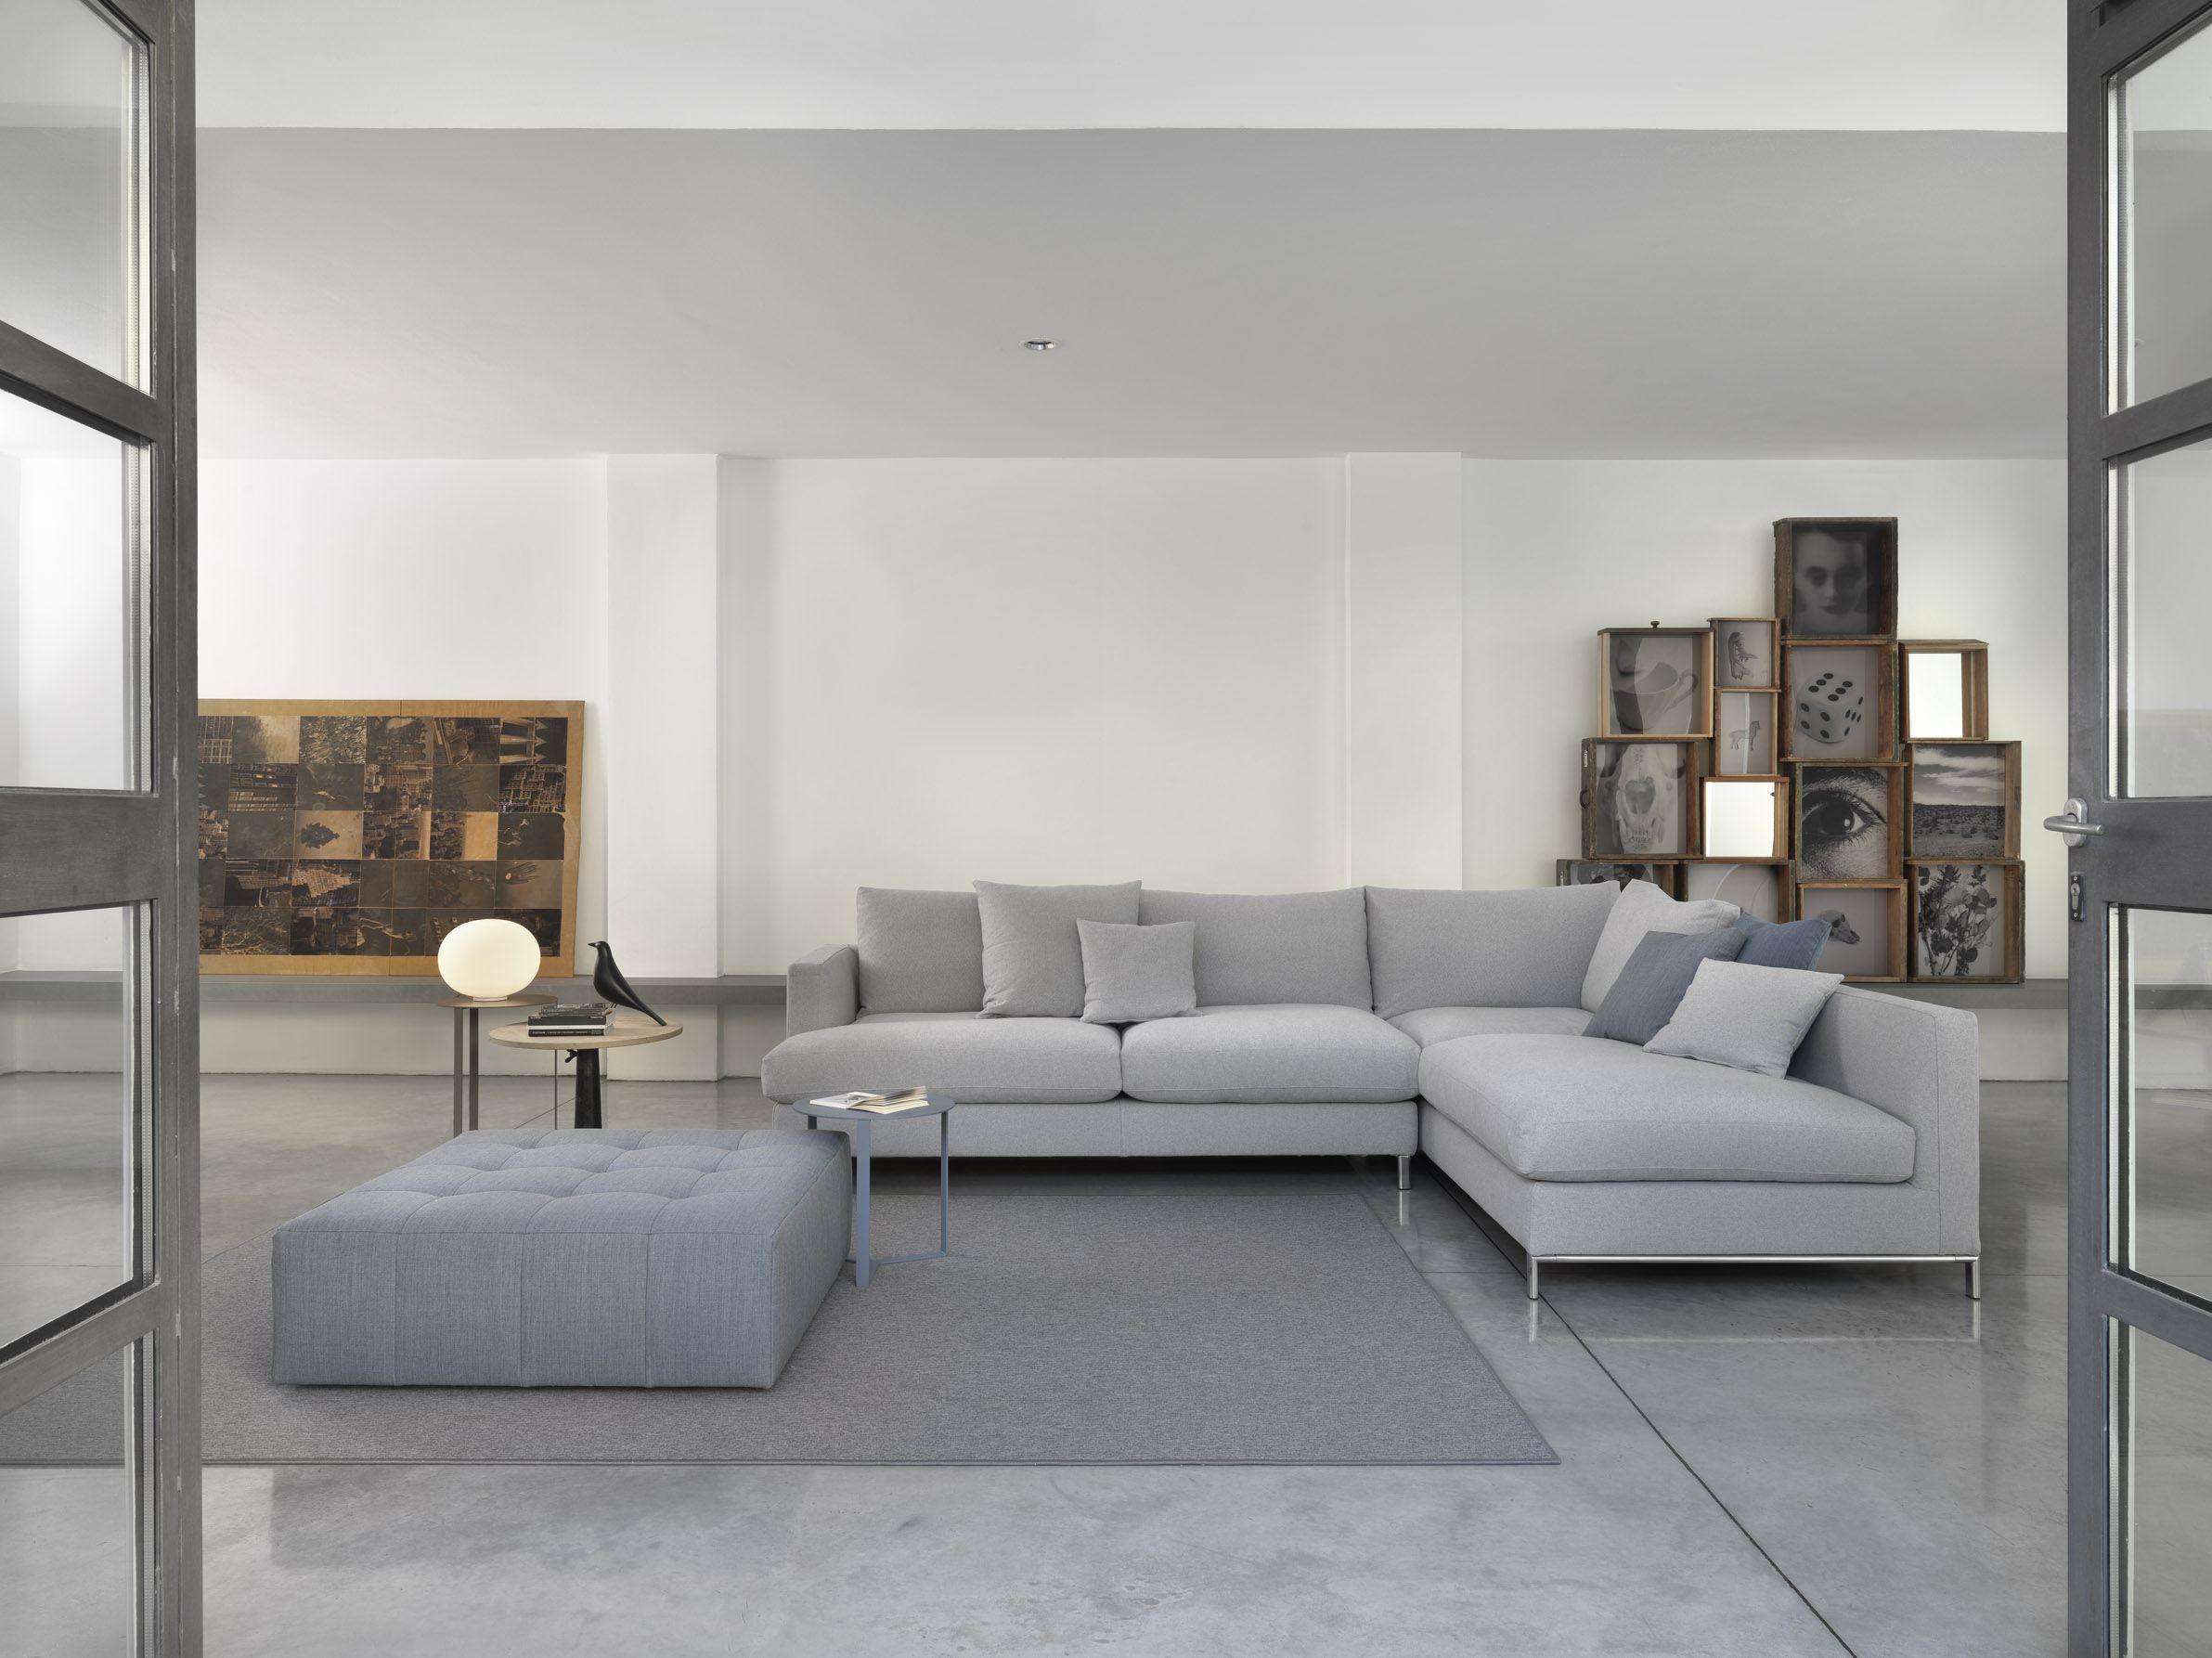 Canapé composable en tissu Collection Loft by Giulio Marelli Italia   design Studio Marelli : loft sectional - Sectionals, Sofas & Couches